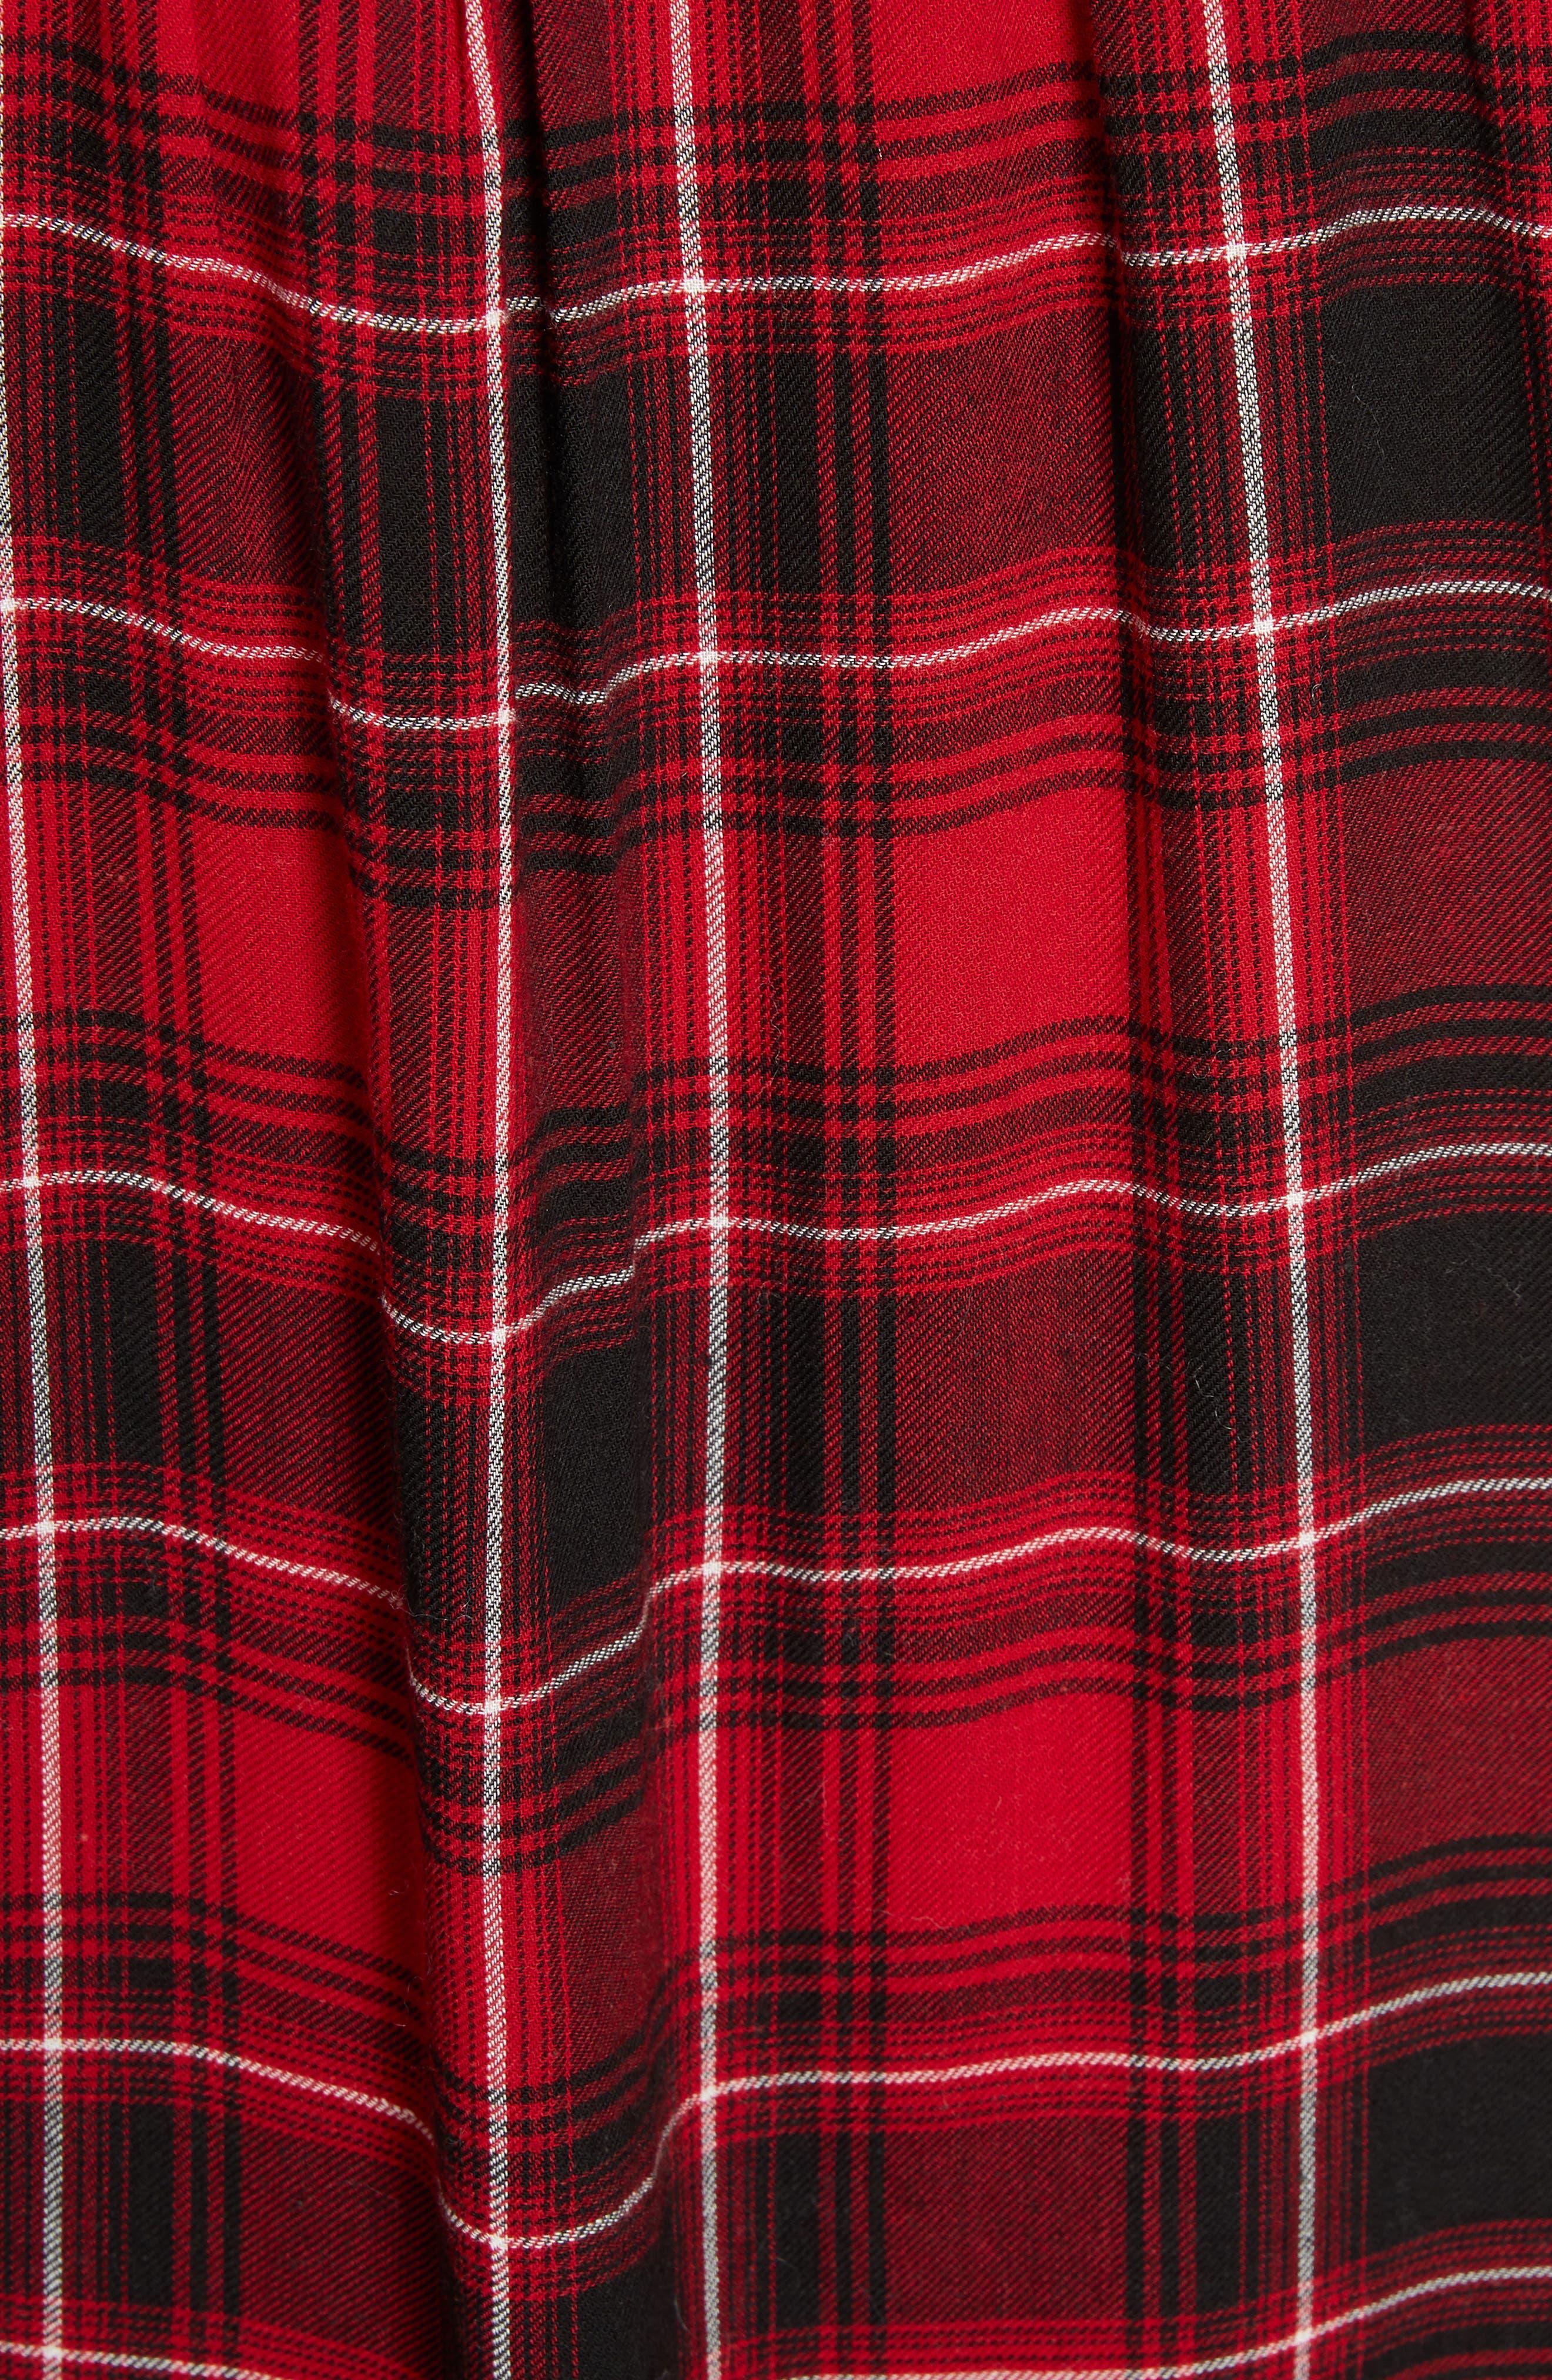 Ruffle Plaid Shirt,                             Alternate thumbnail 5, color,                             RED/ BLACK